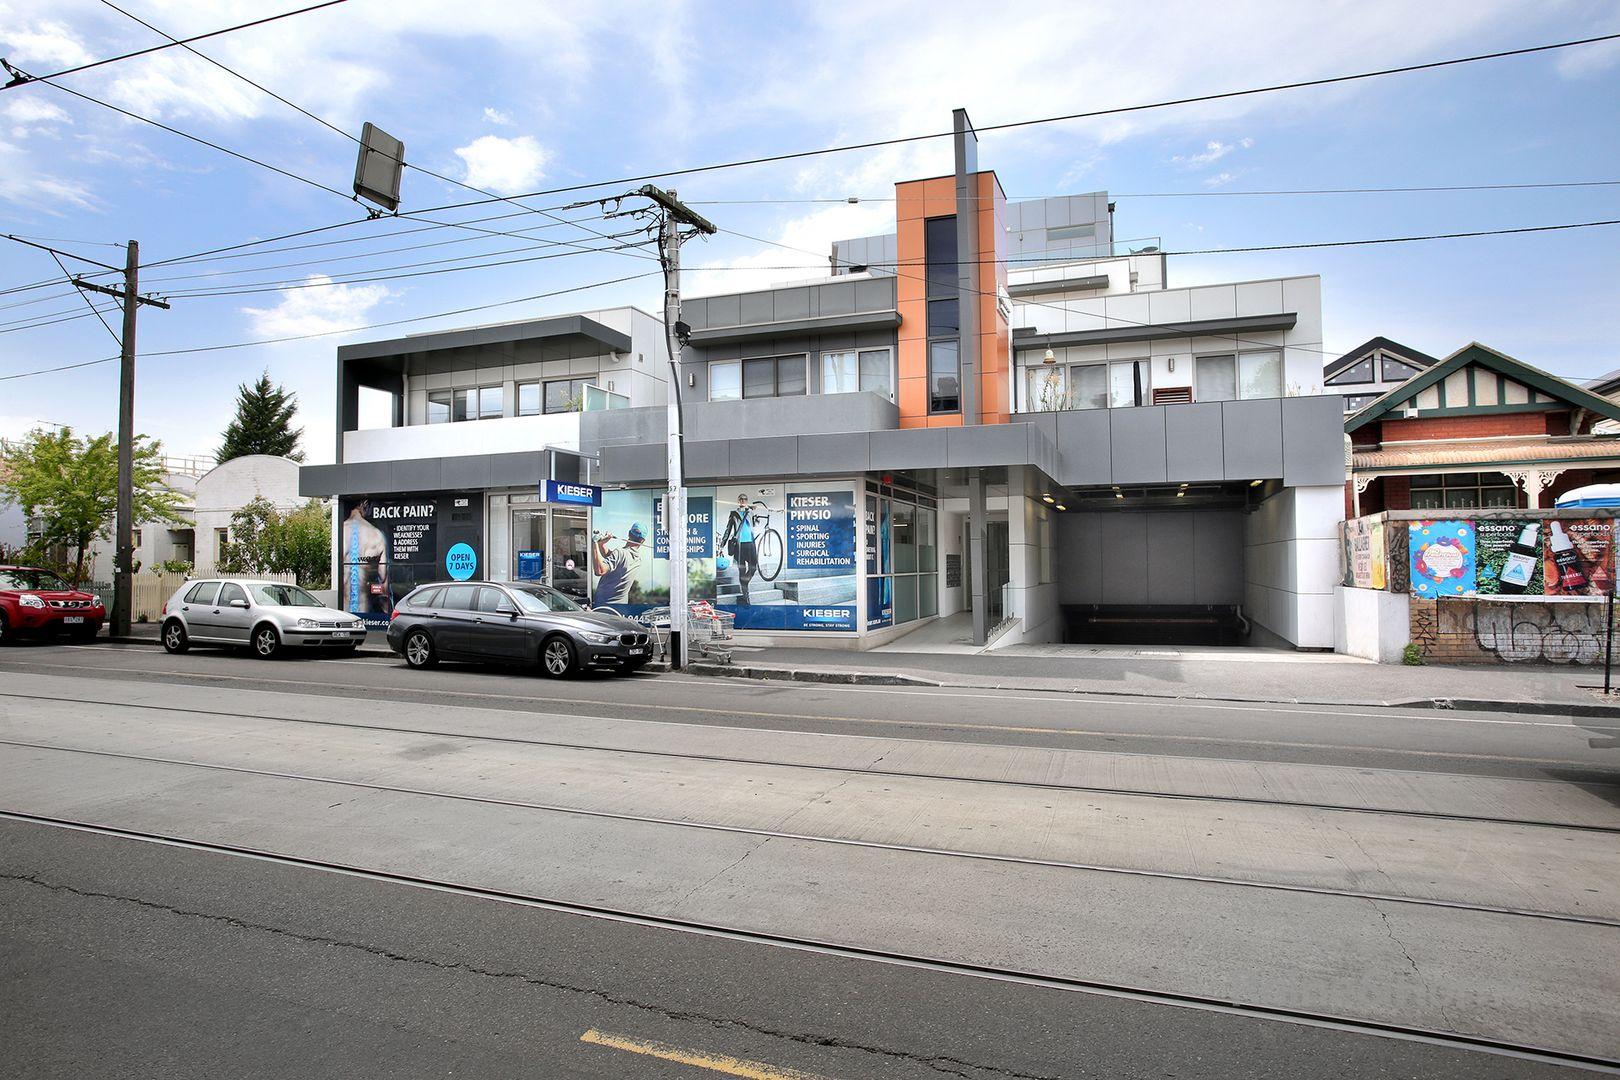 212/500 Brunswick Street, Fitzroy VIC 3065, Image 0